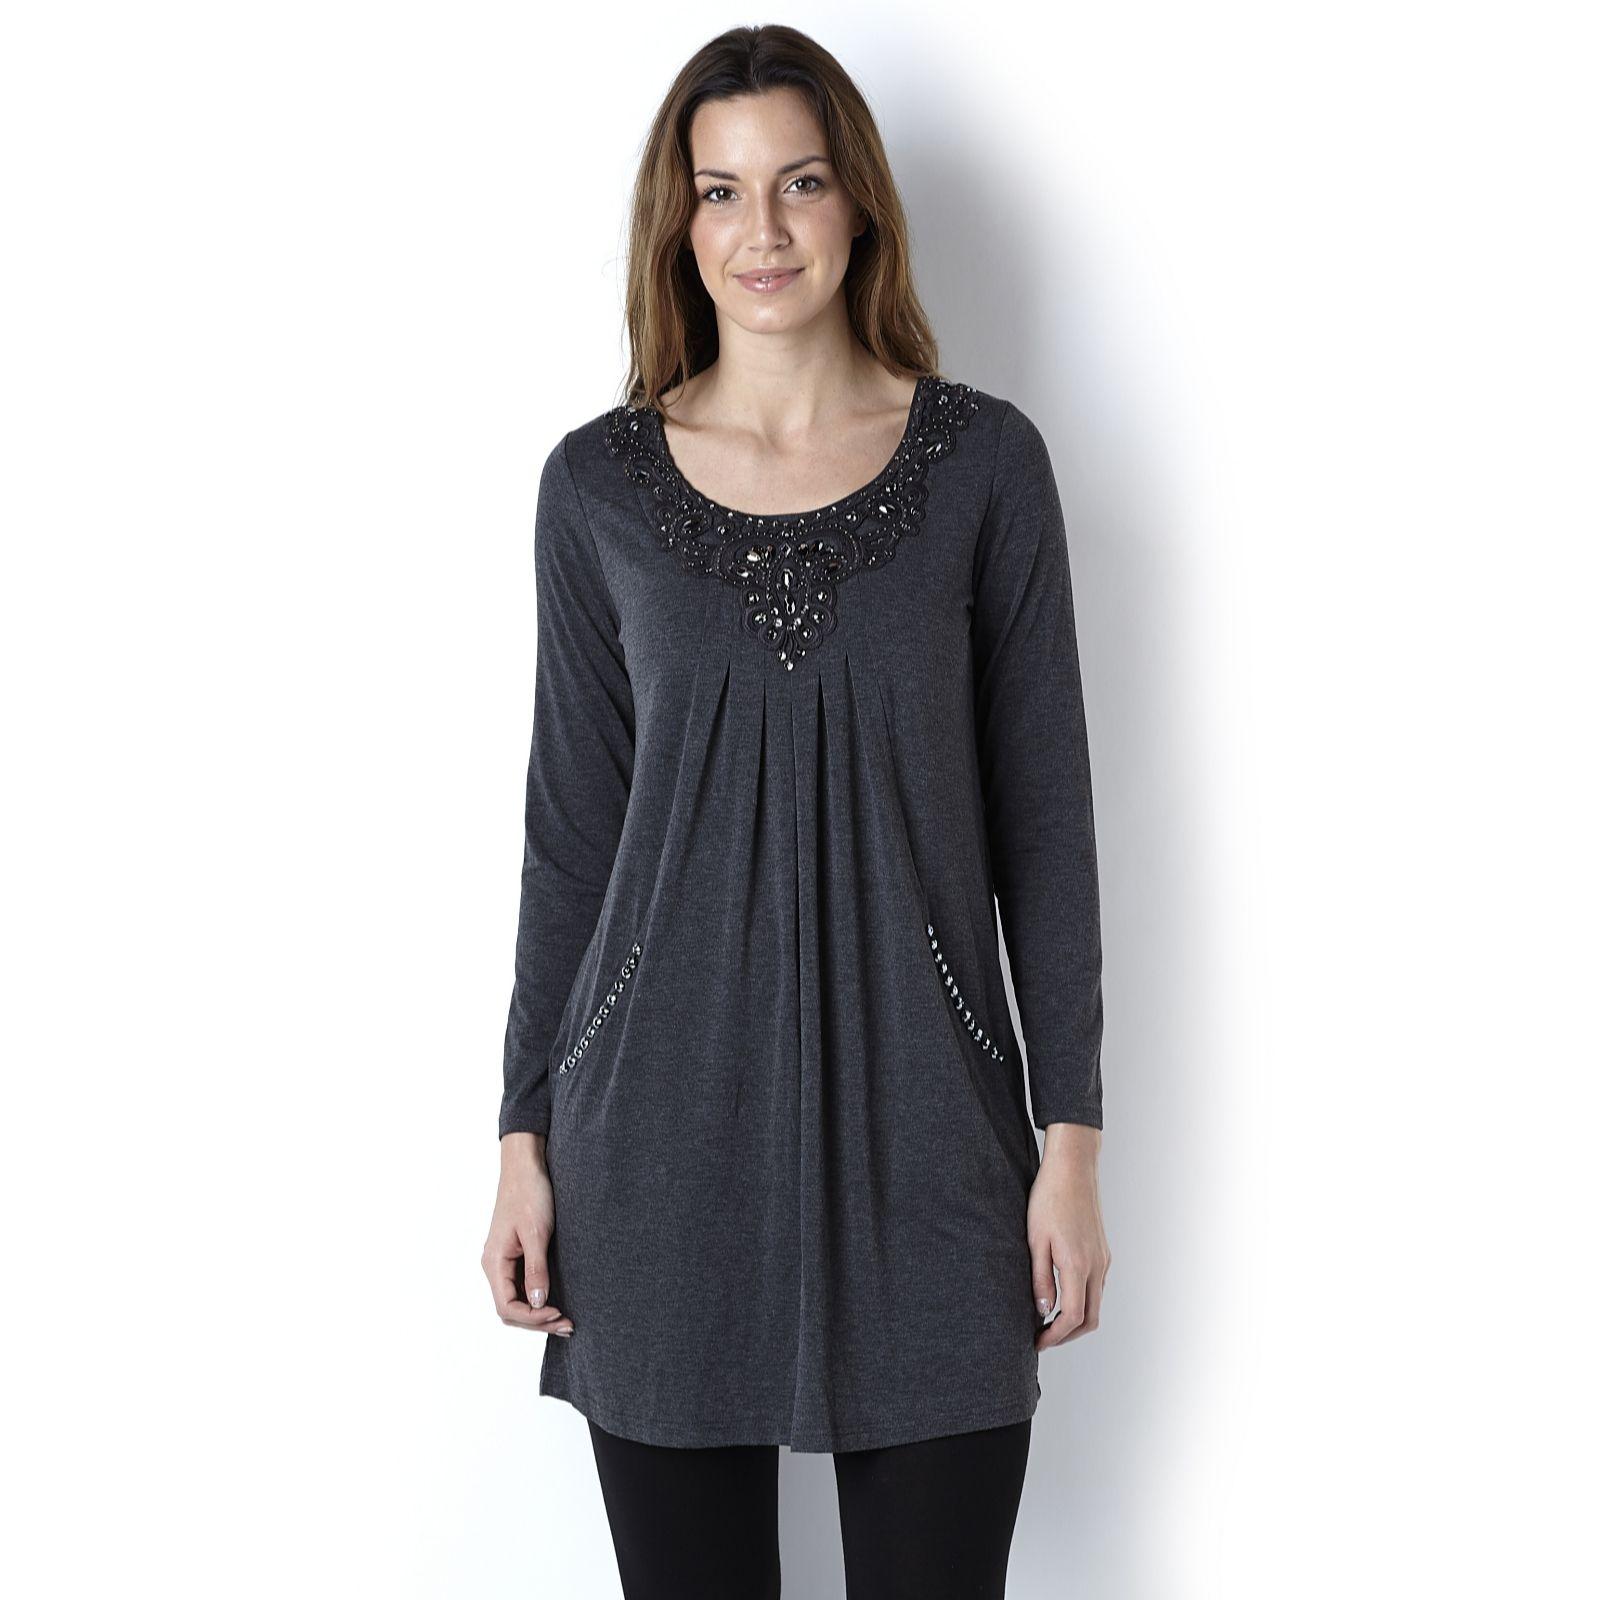 Together — Tunic Tops — Tops & T-Shirts — Fashion - QVC UK